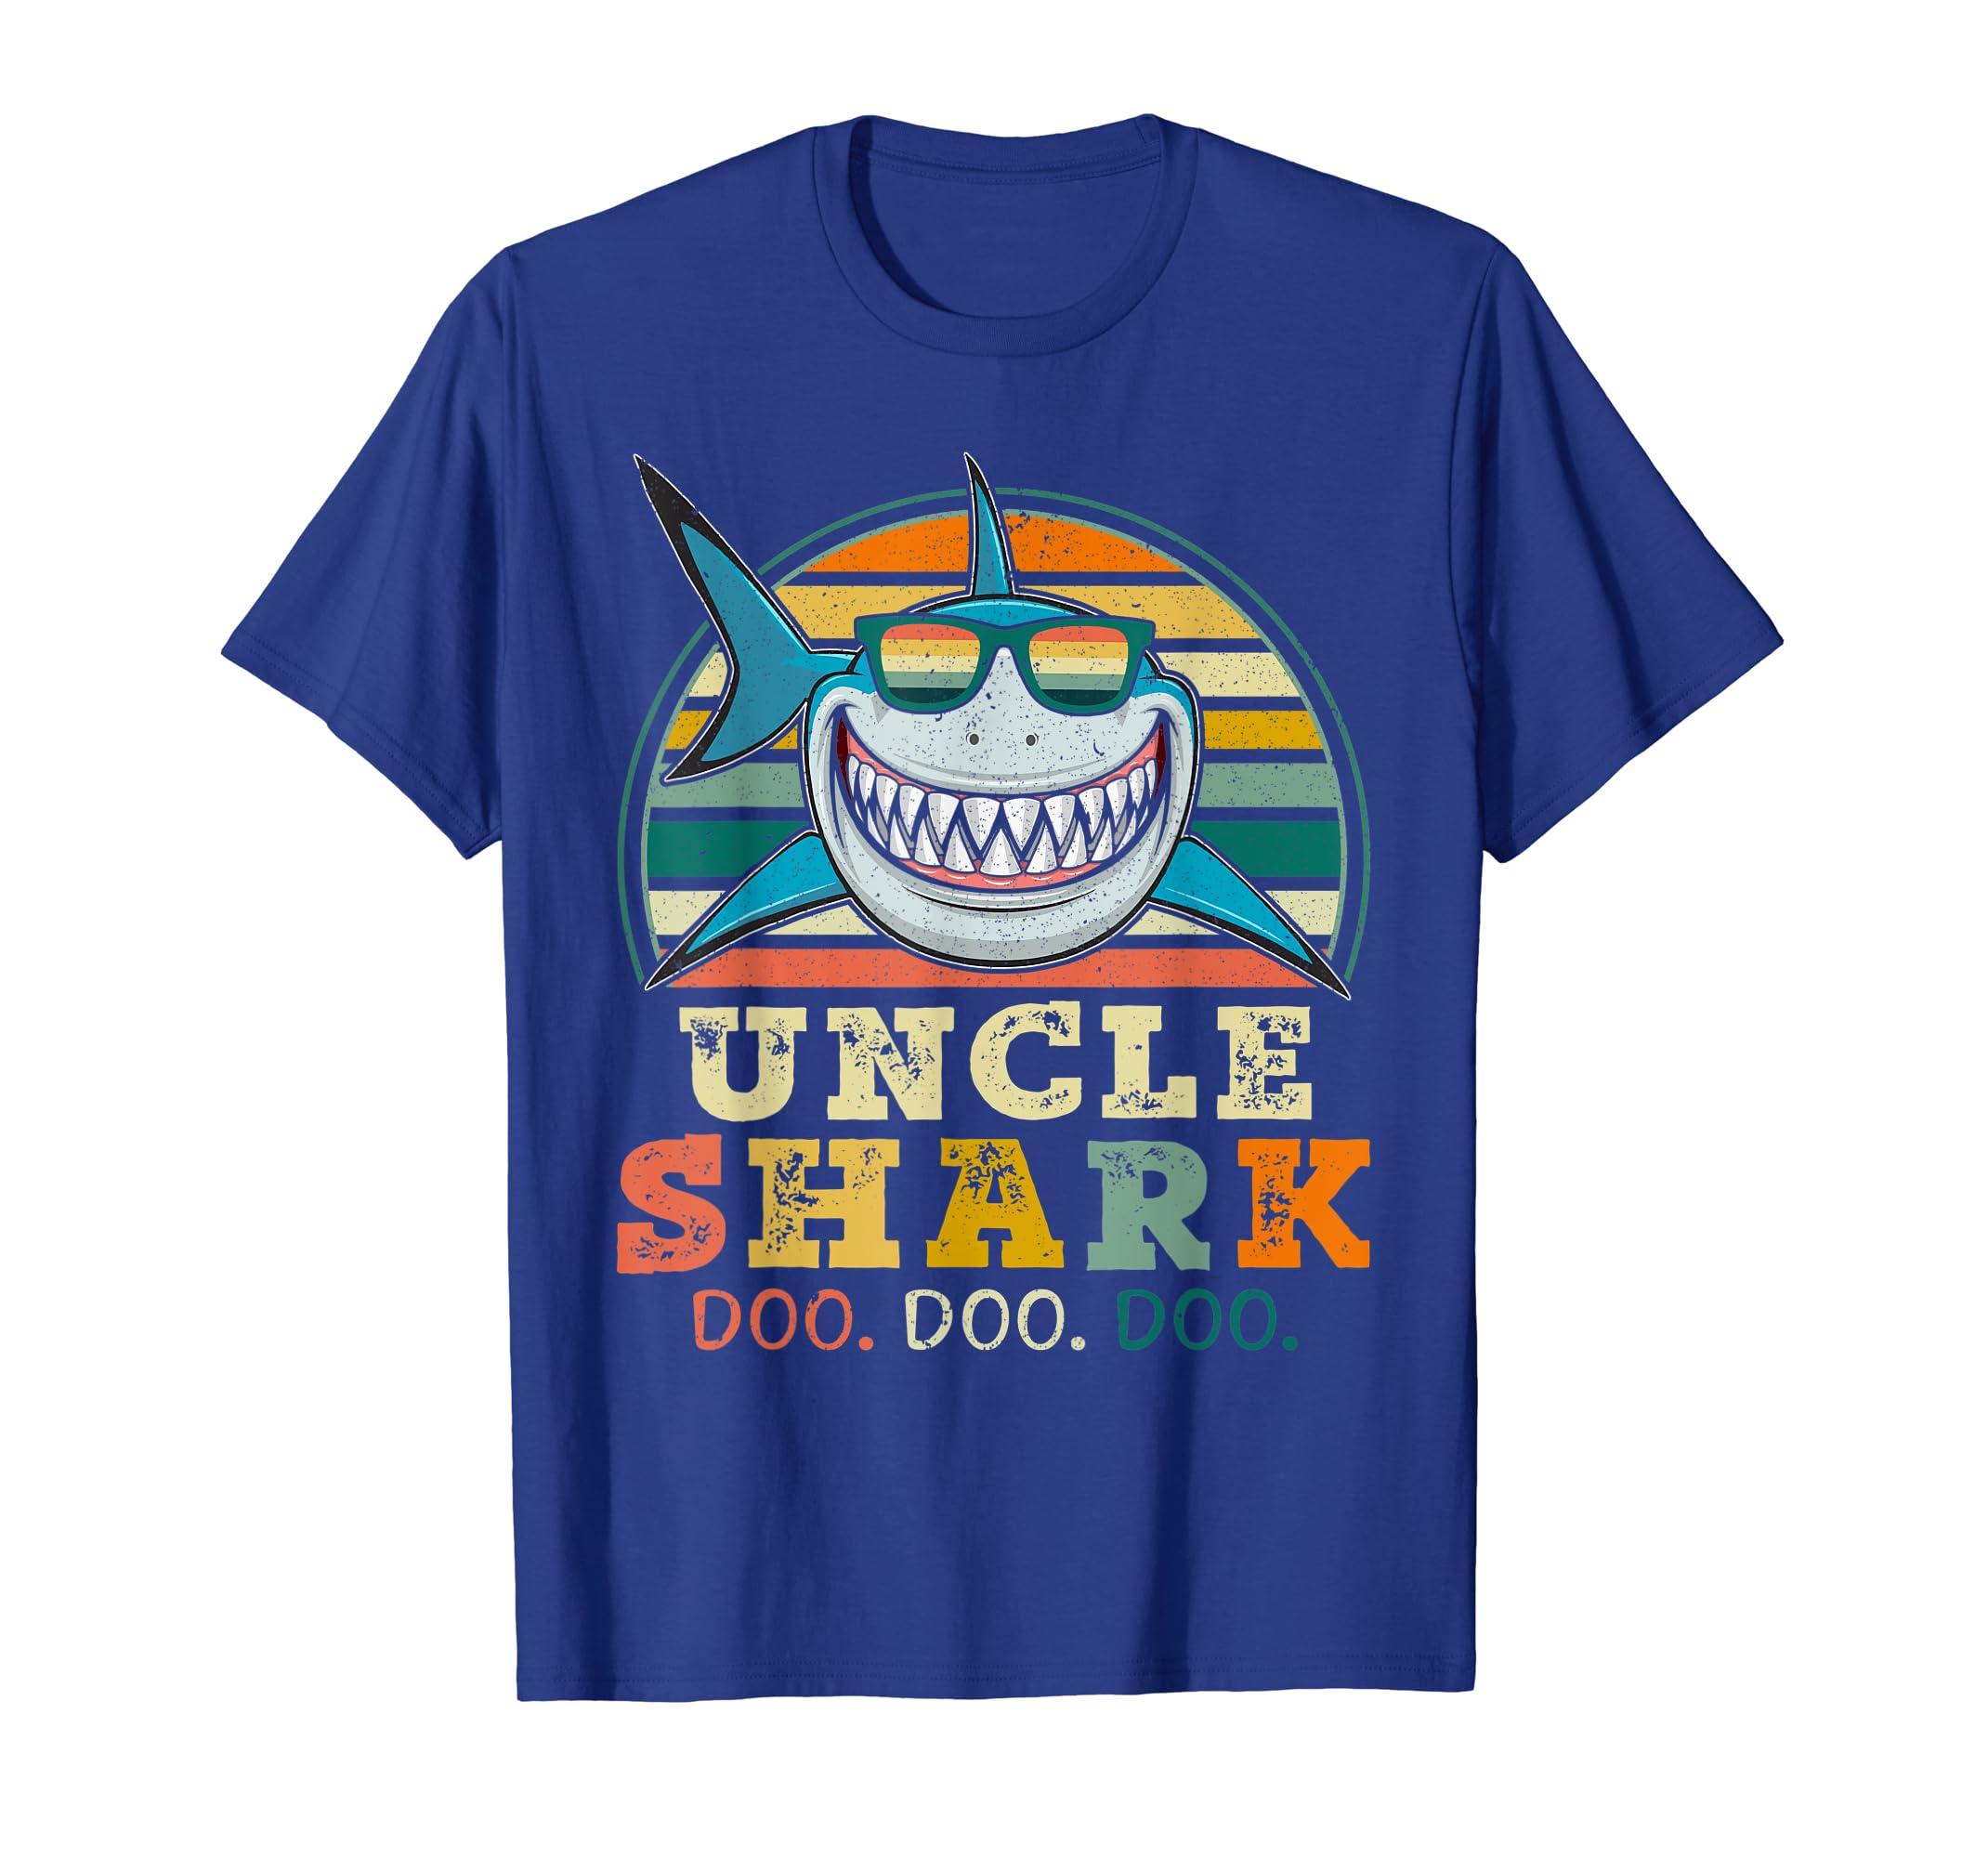 612c6900 Amazon.com: Retro Vintage Uncle Shark TShirt Funny Birthday Gifts Family:  Clothing